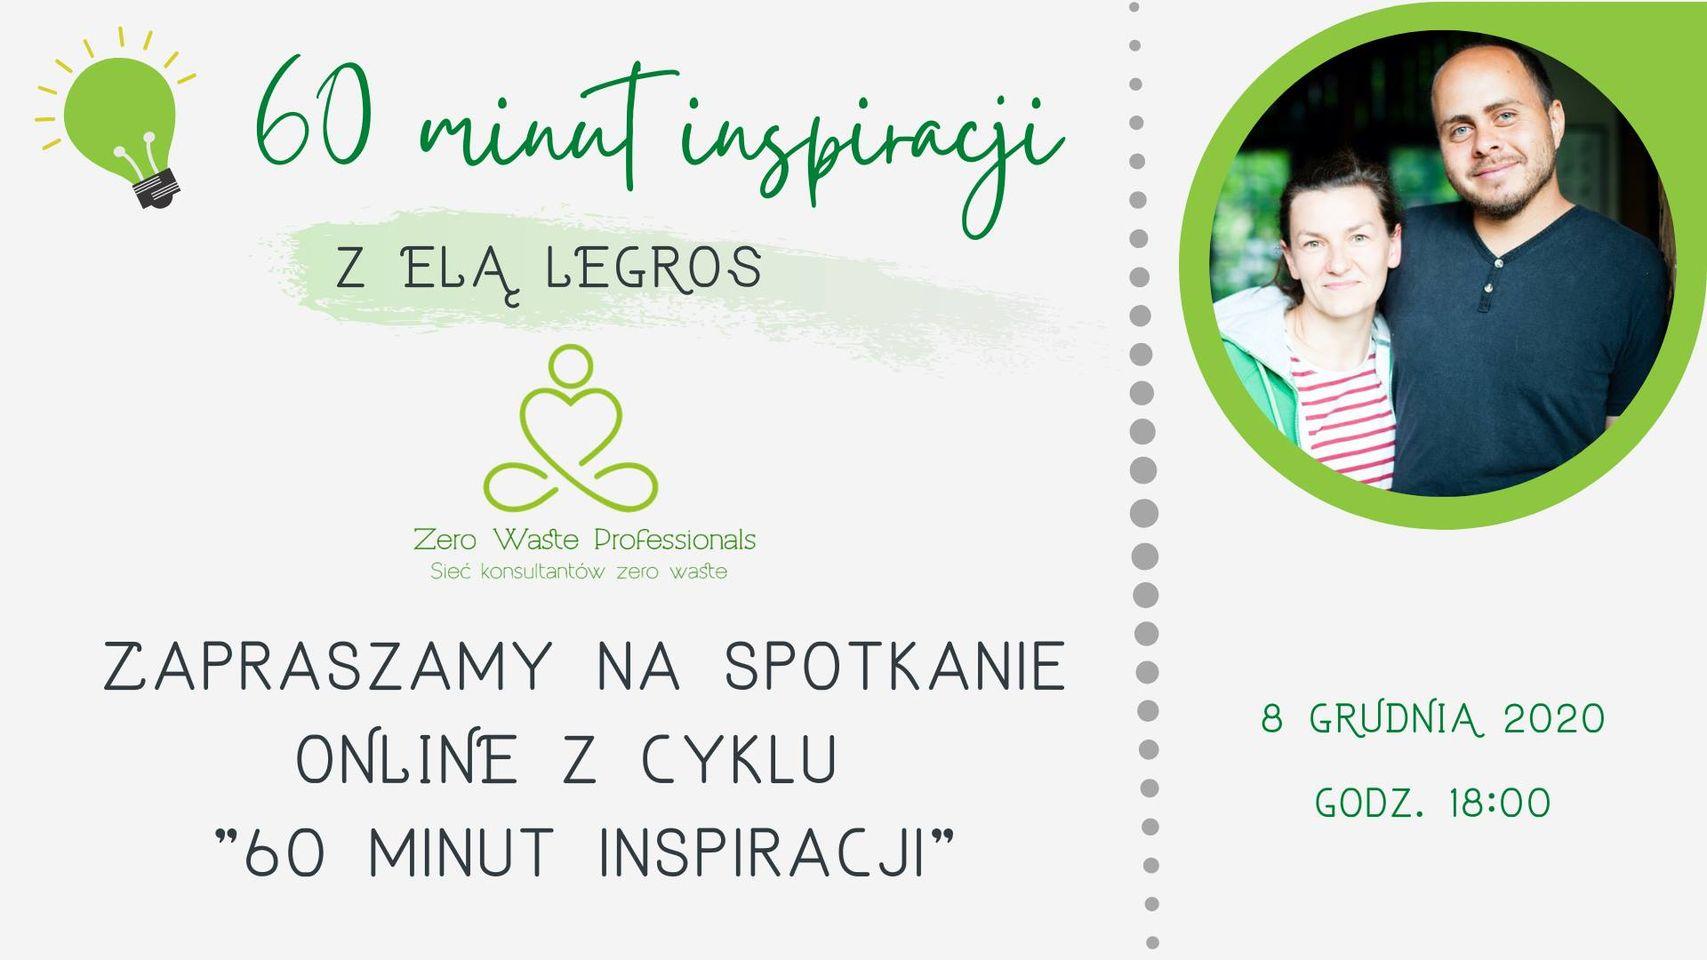 Affiche rencontre virtuelle Facebook Ela Legros Zero Waste